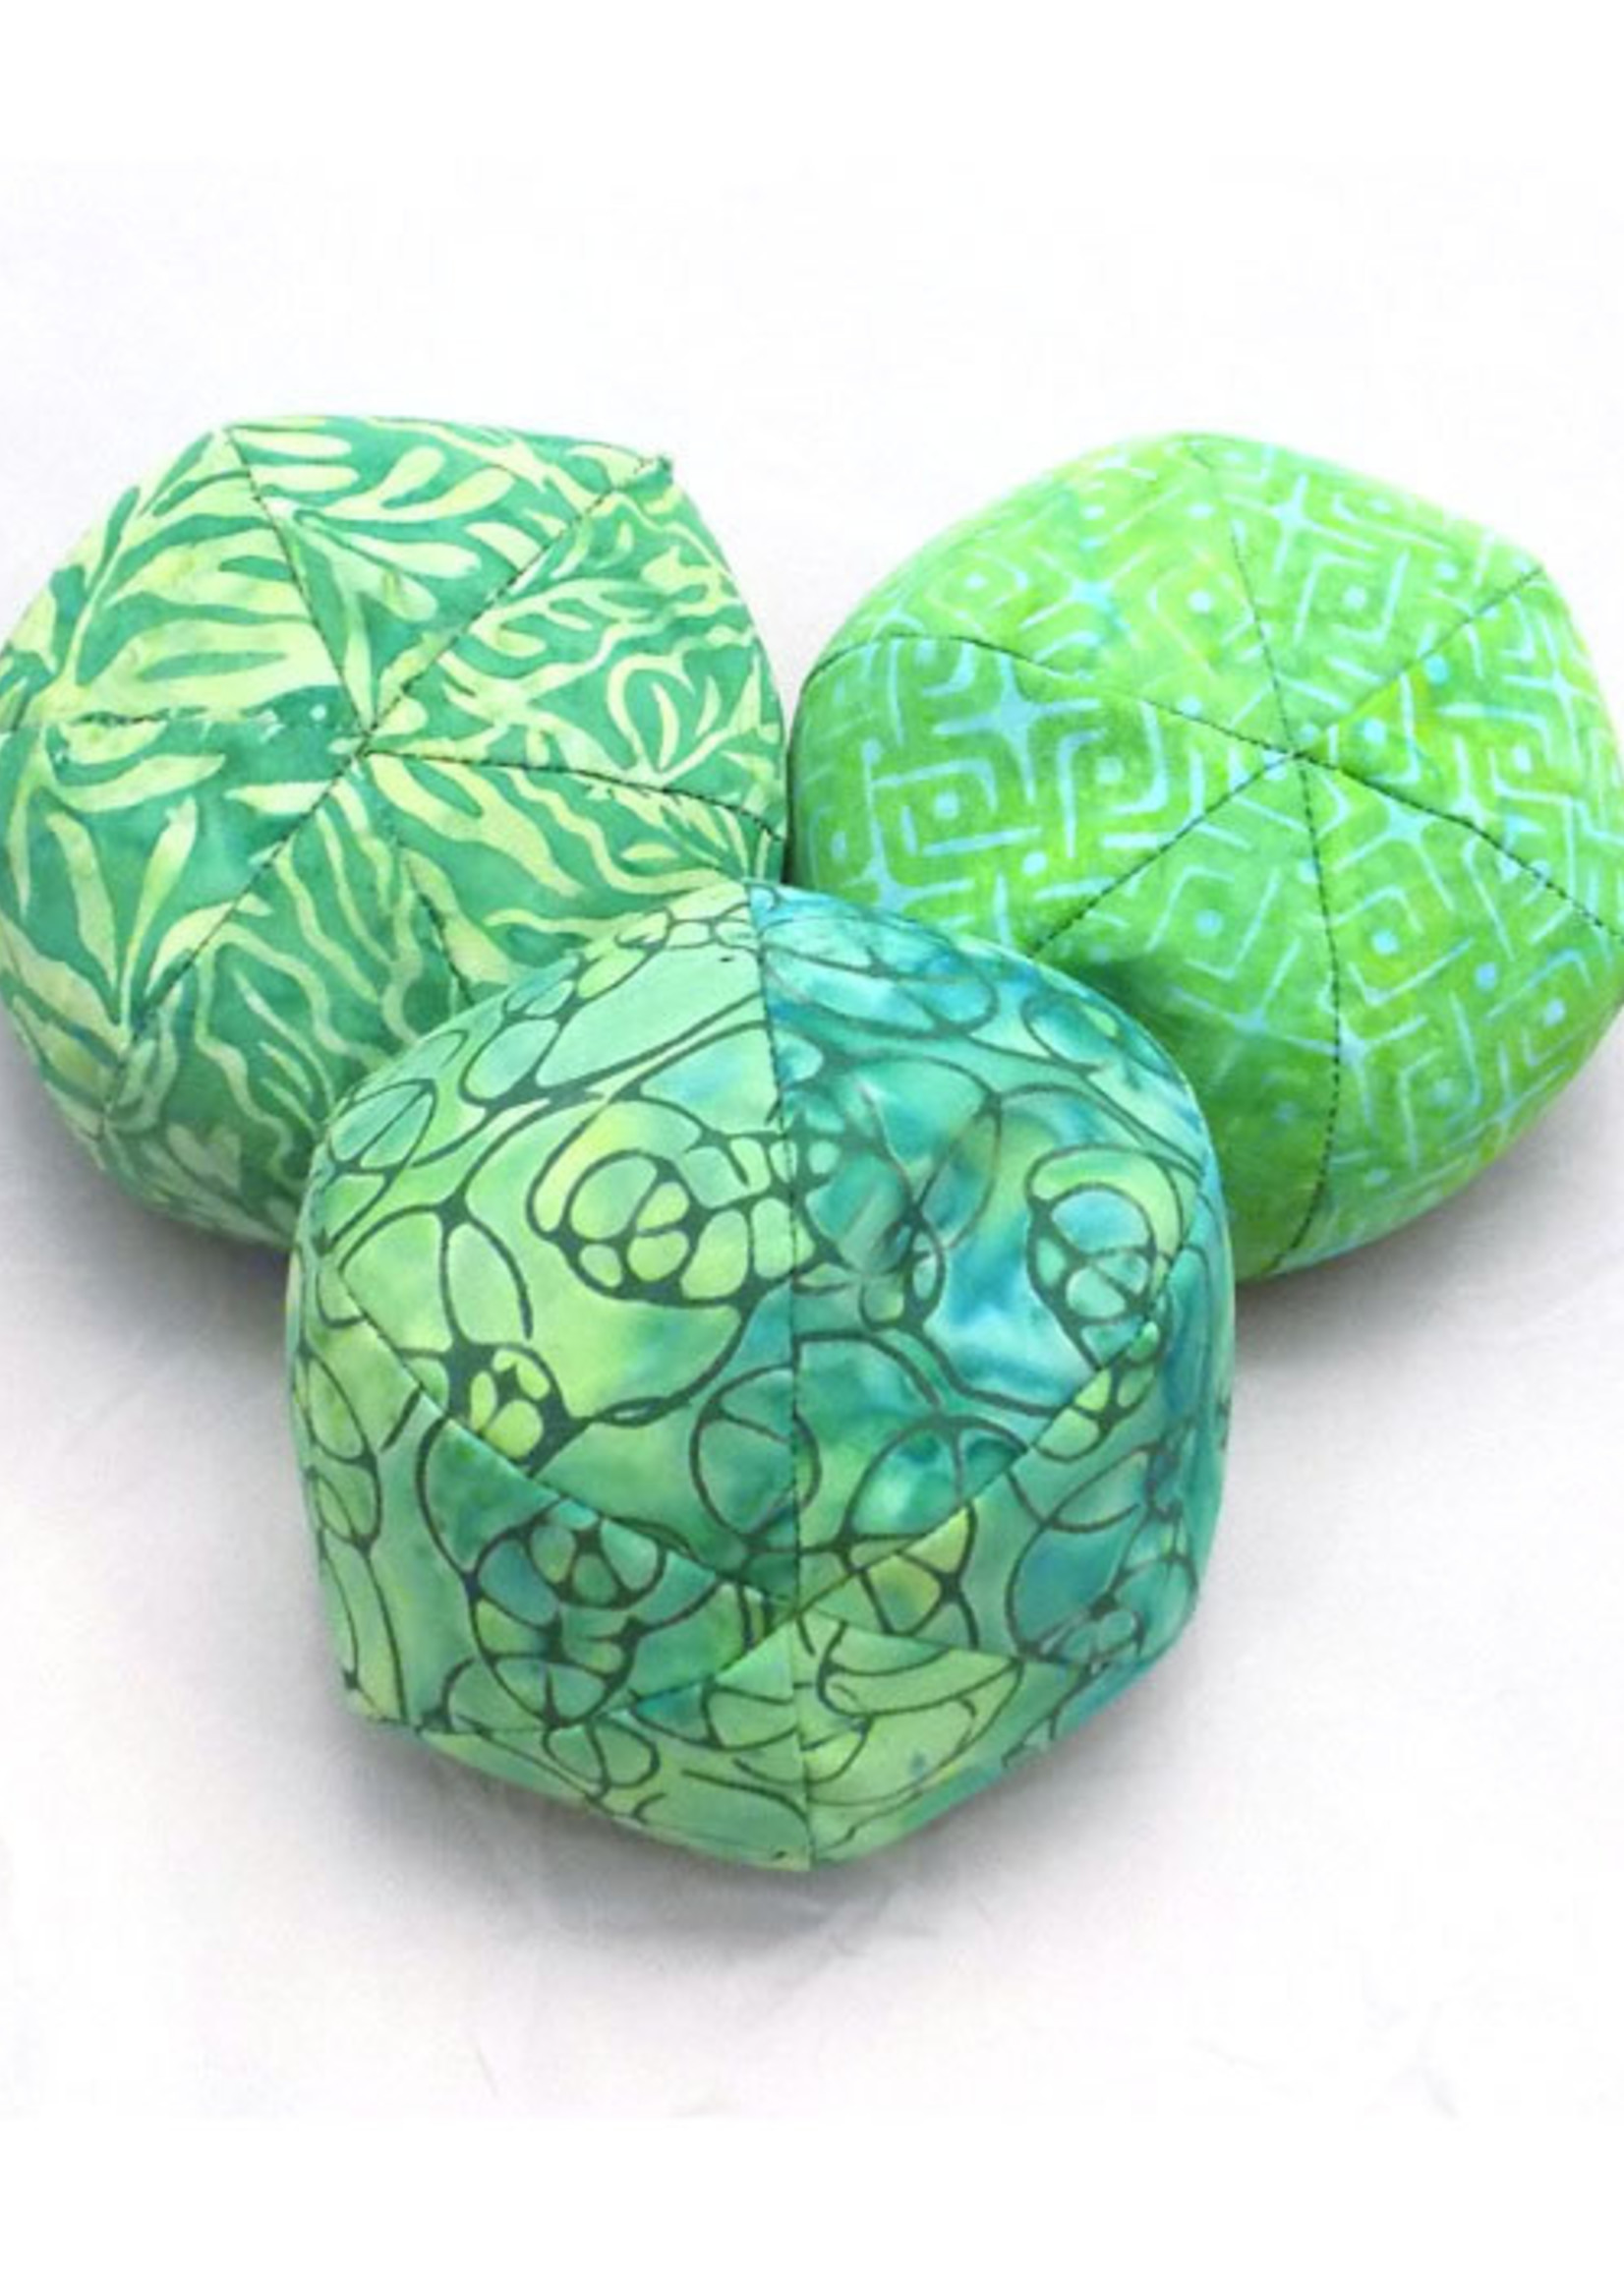 The Good Medicine Ball